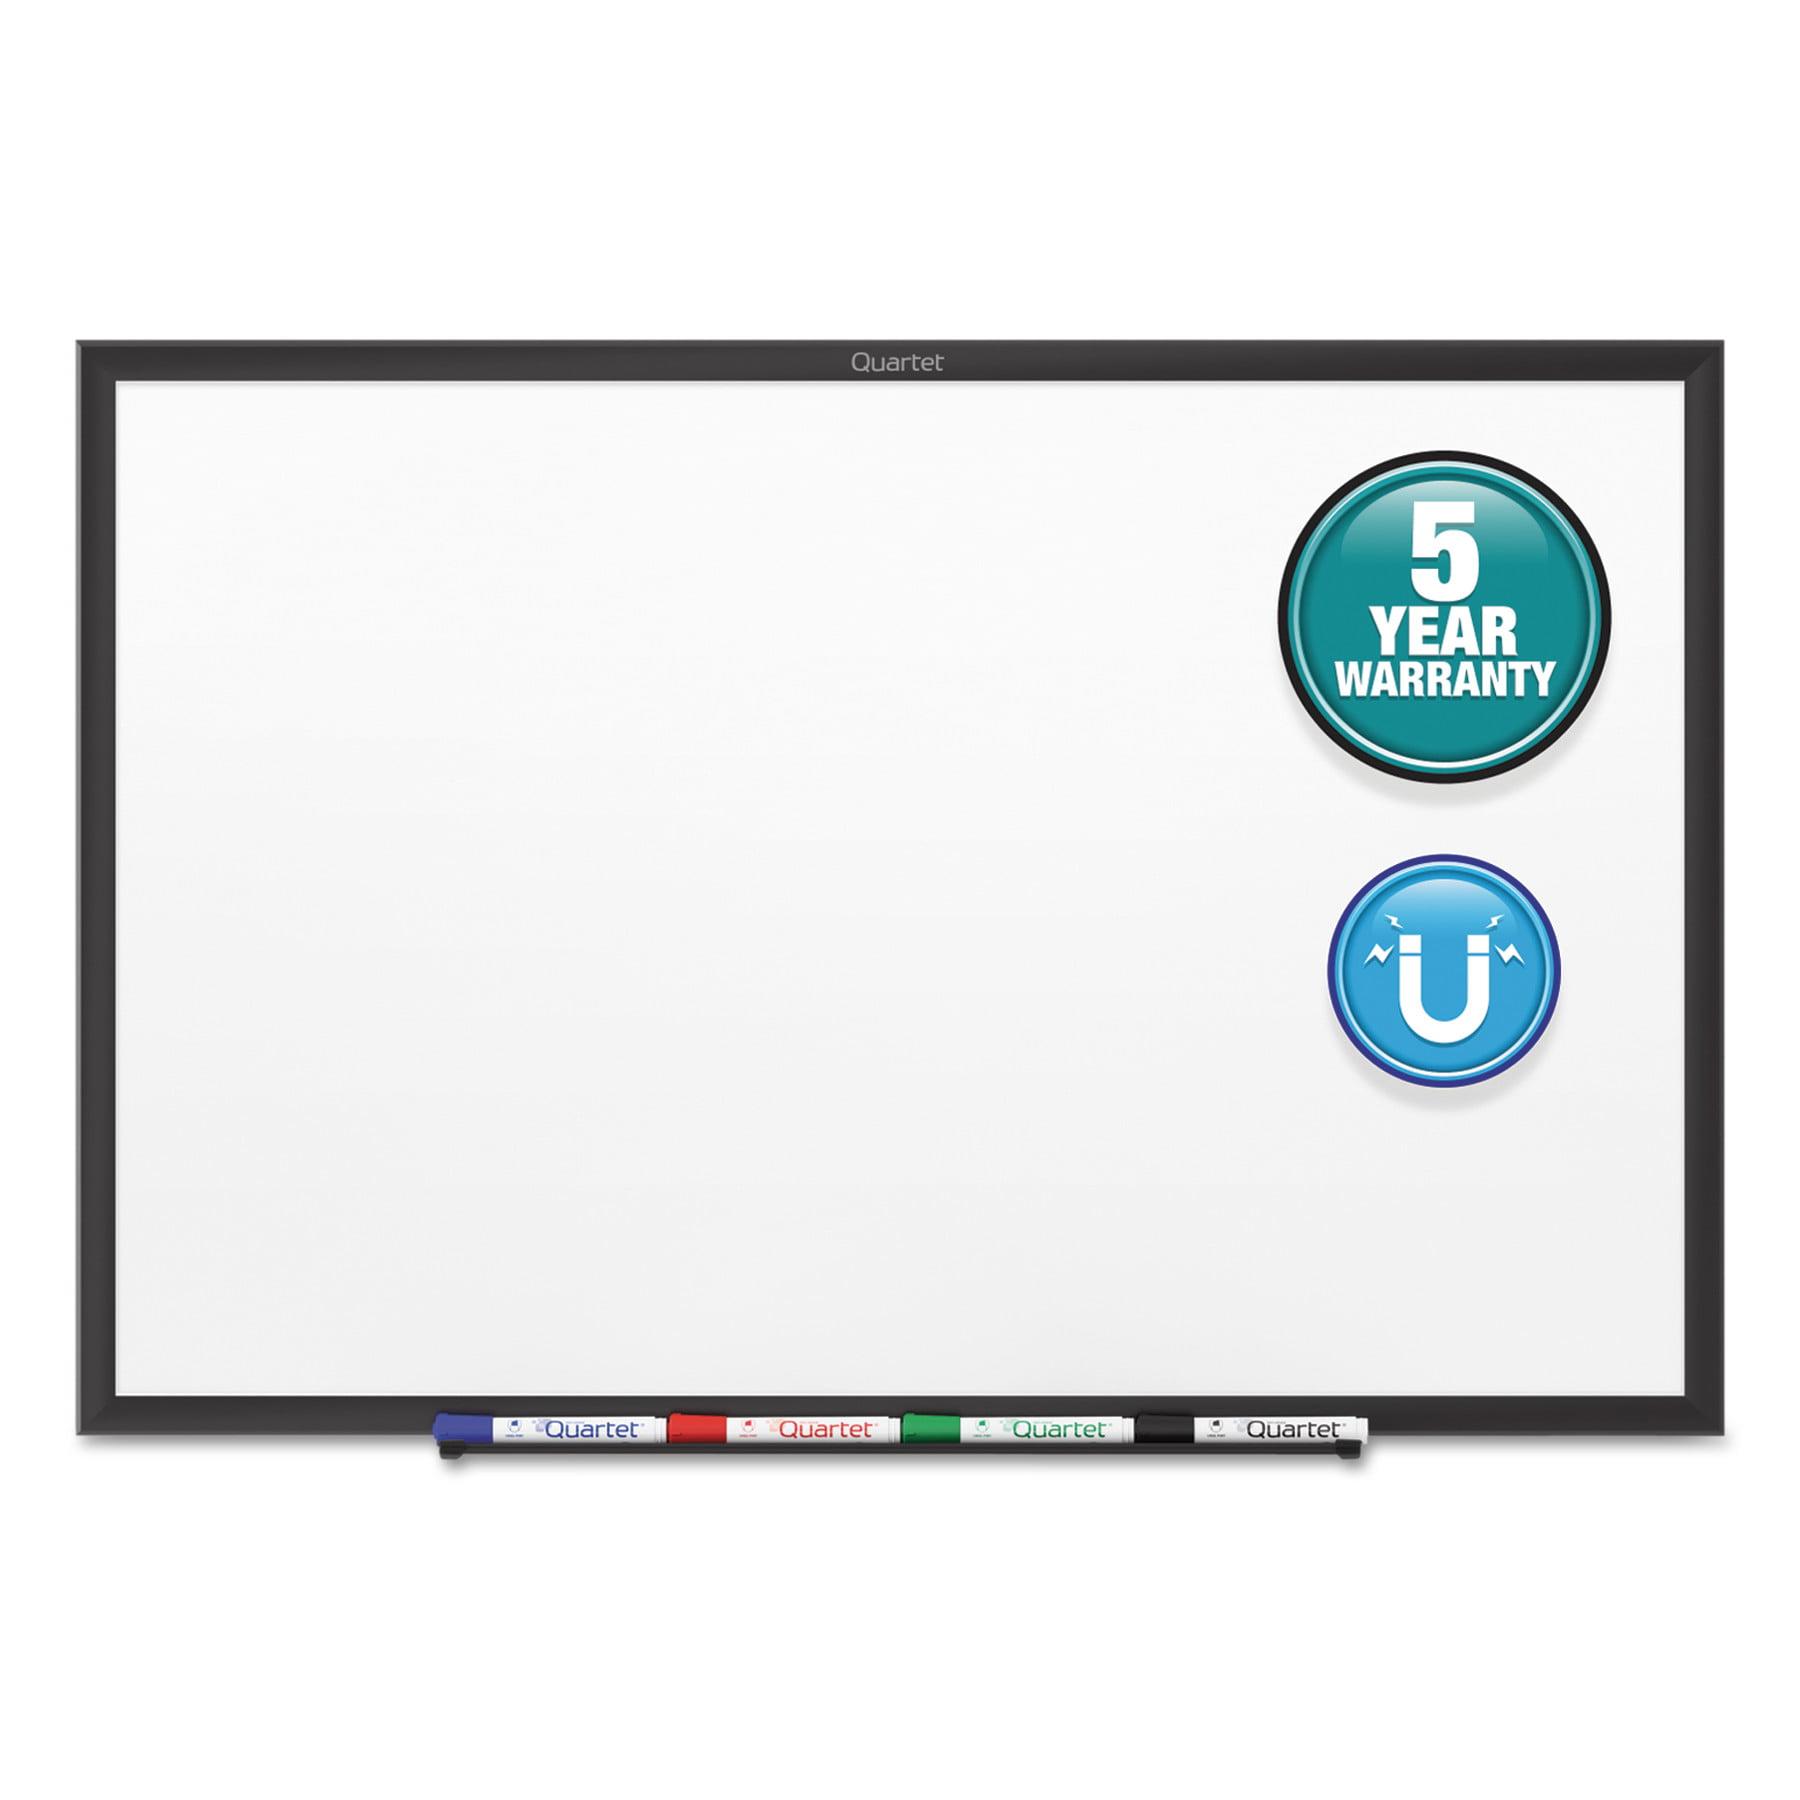 Quartet Classic Series Magnetic Whiteboard, 96 x 48, Black Aluminum Frame by QUARTET MFG.